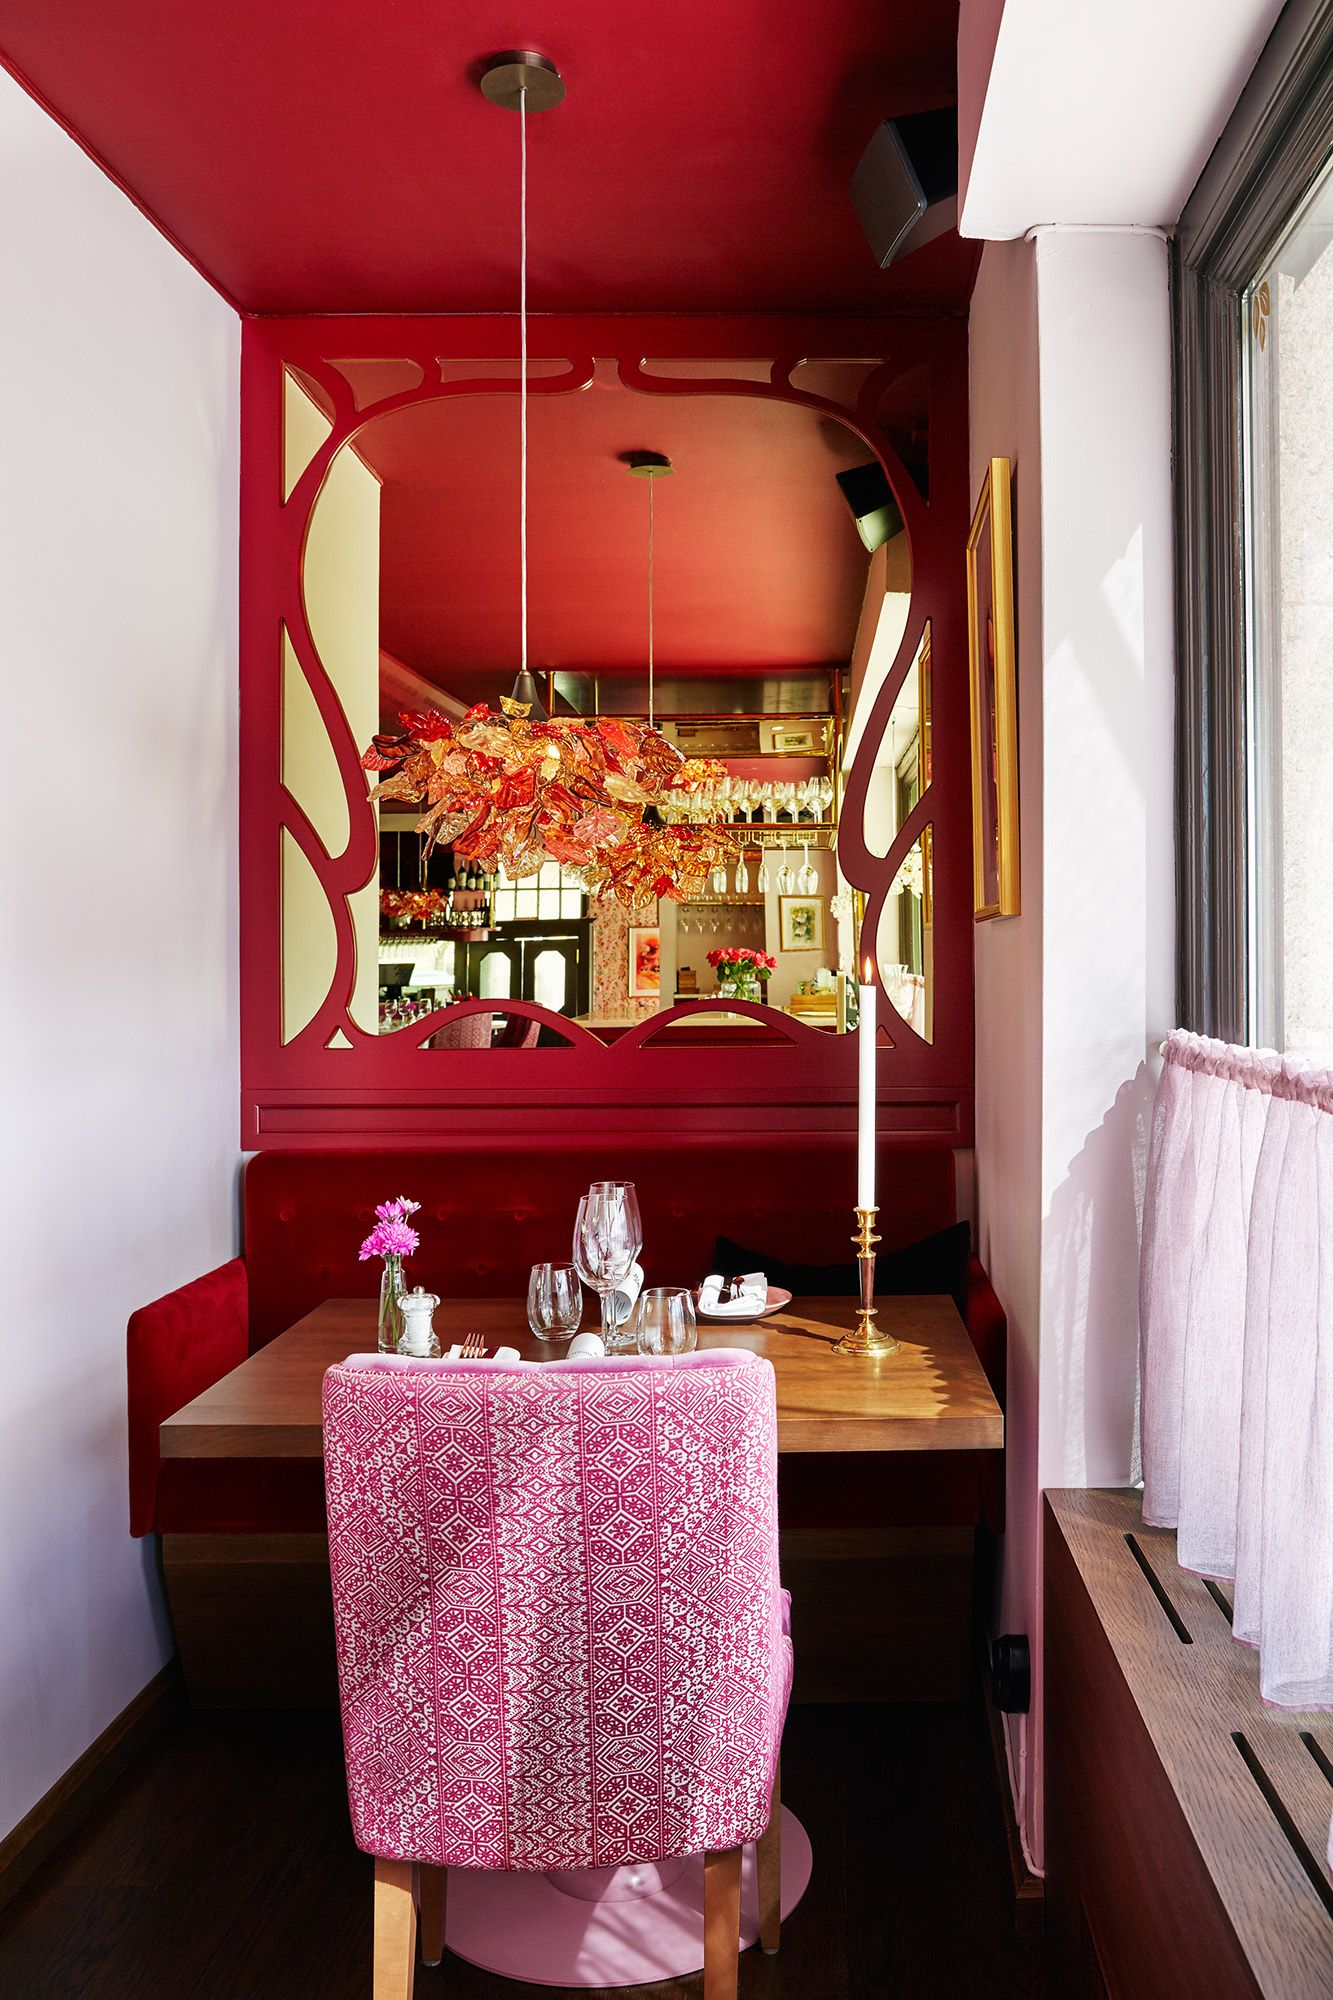 Restaurant Tegelbacken Is A Restaurant In The Center Of